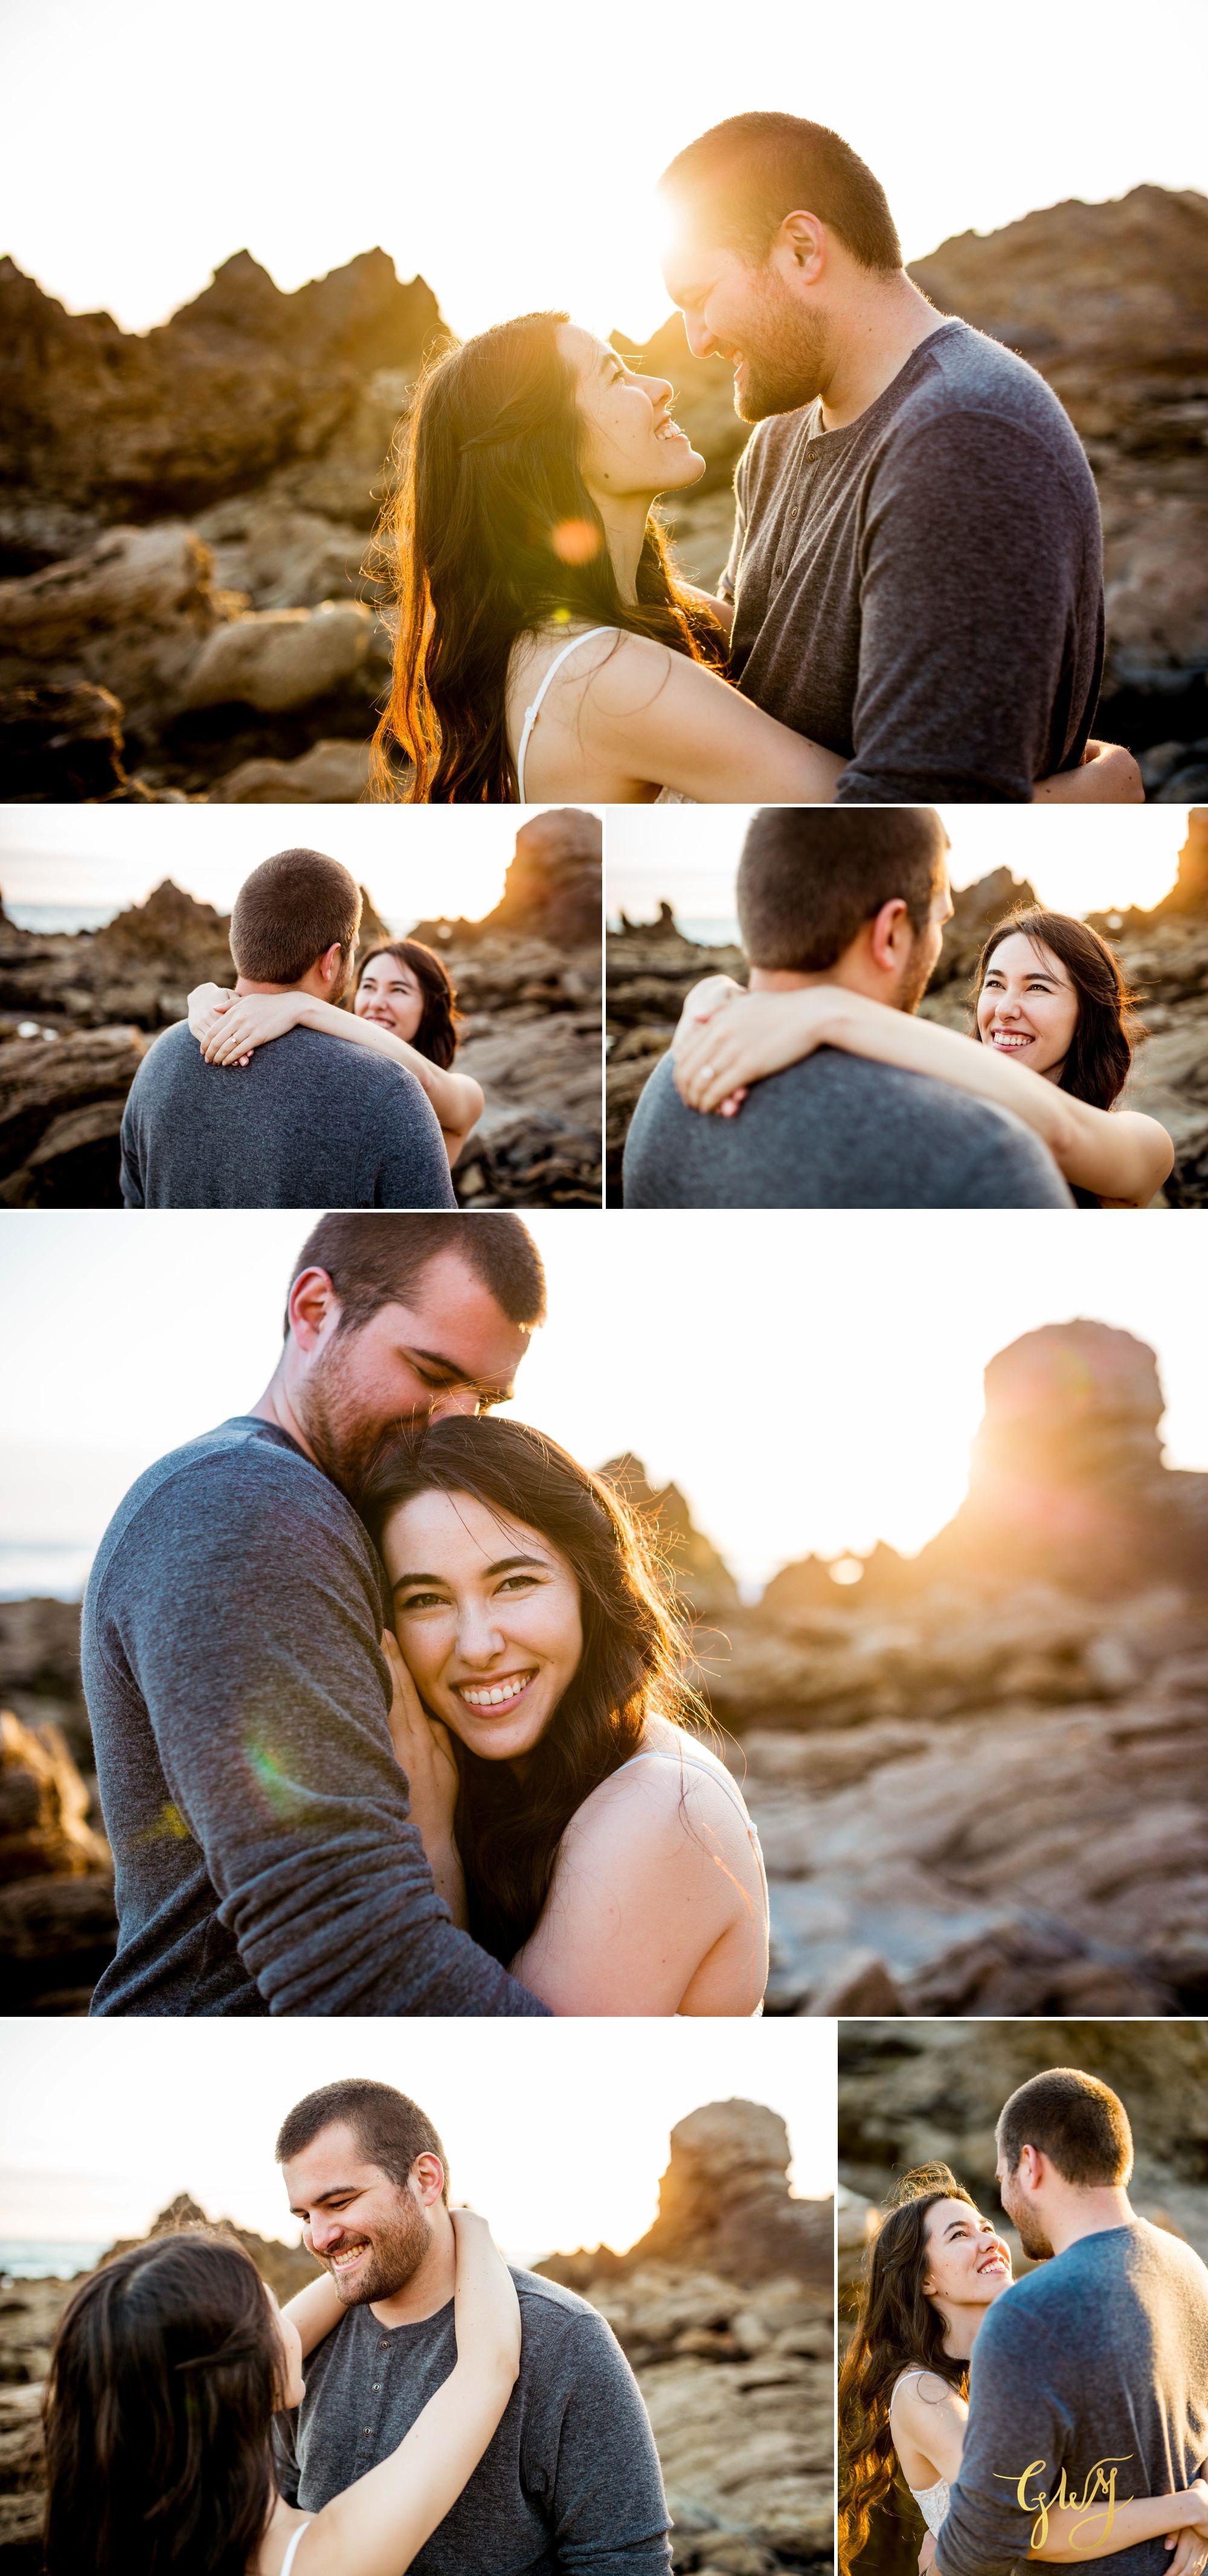 Ashley + Brandt California Super Bloom and Little Corona Del Mar Beach Engagement by Glass Woods Media 13.jpg